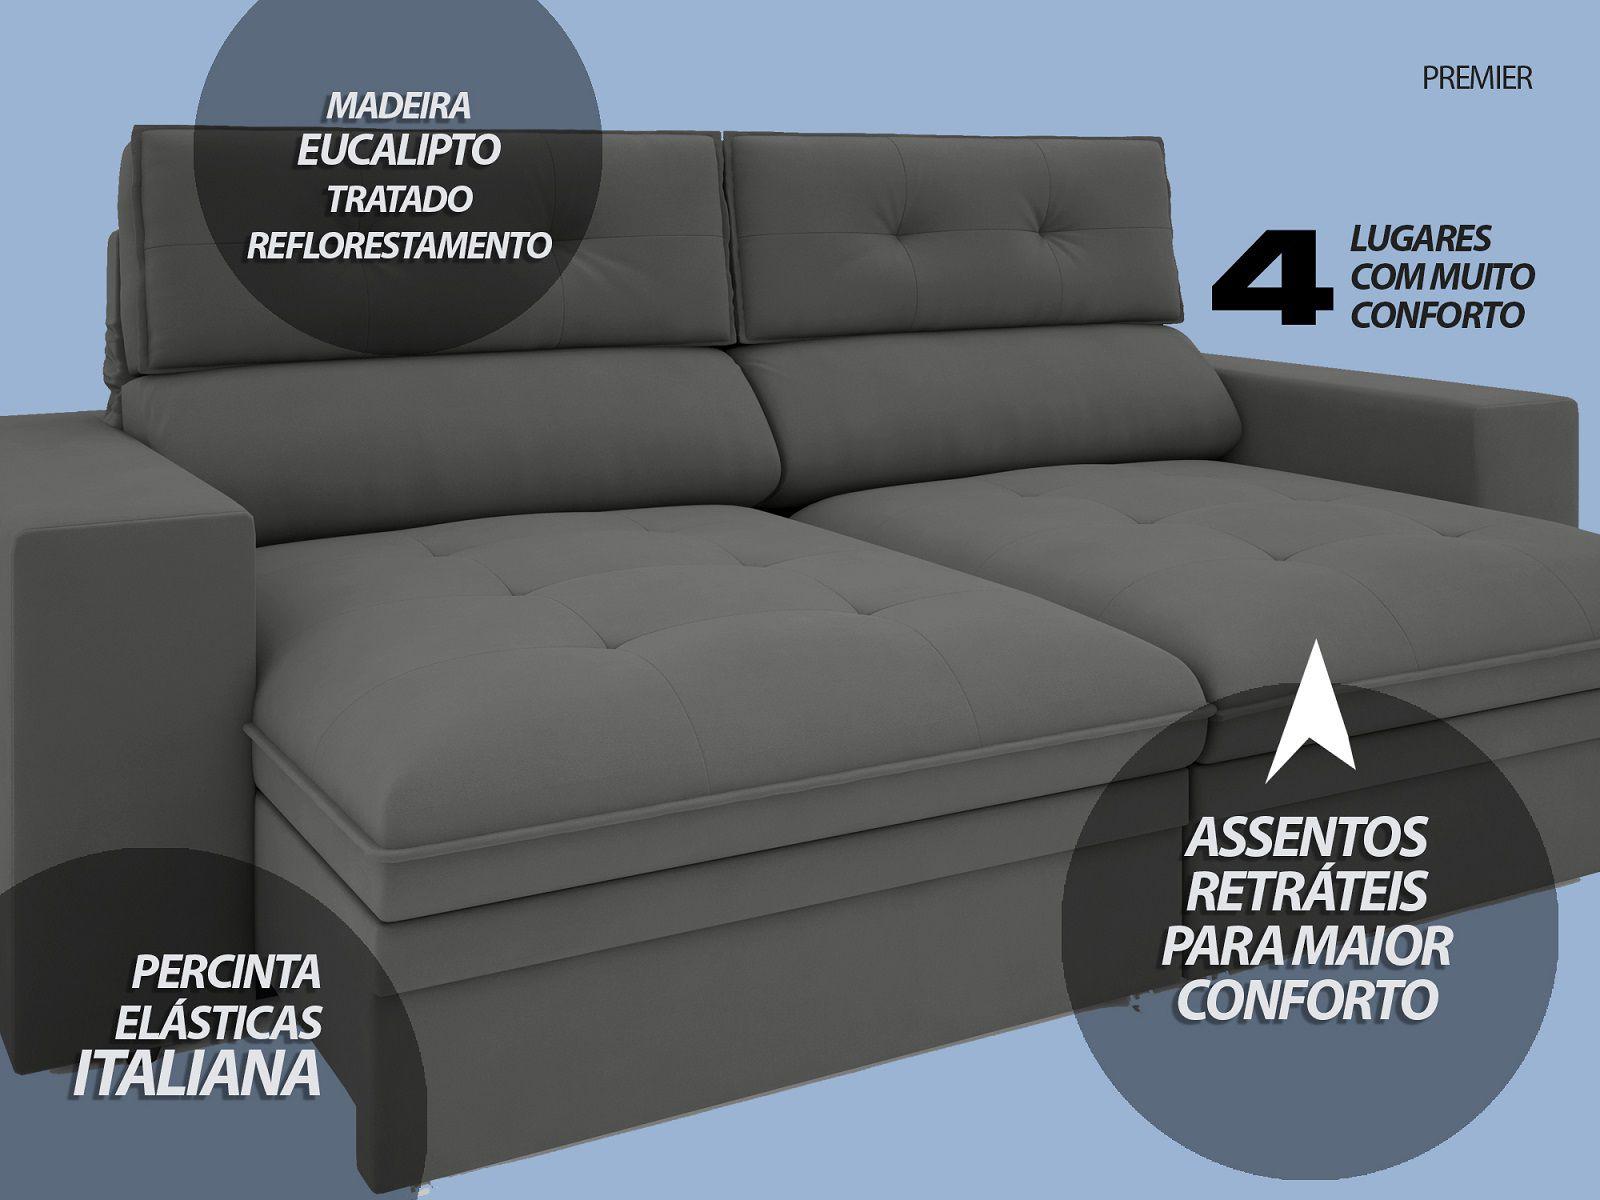 Sofá Premier 2,23m Retrátil e Reclinável Com Baú Velosuede Grafite - NETSOFAS  - NETSOFÁS